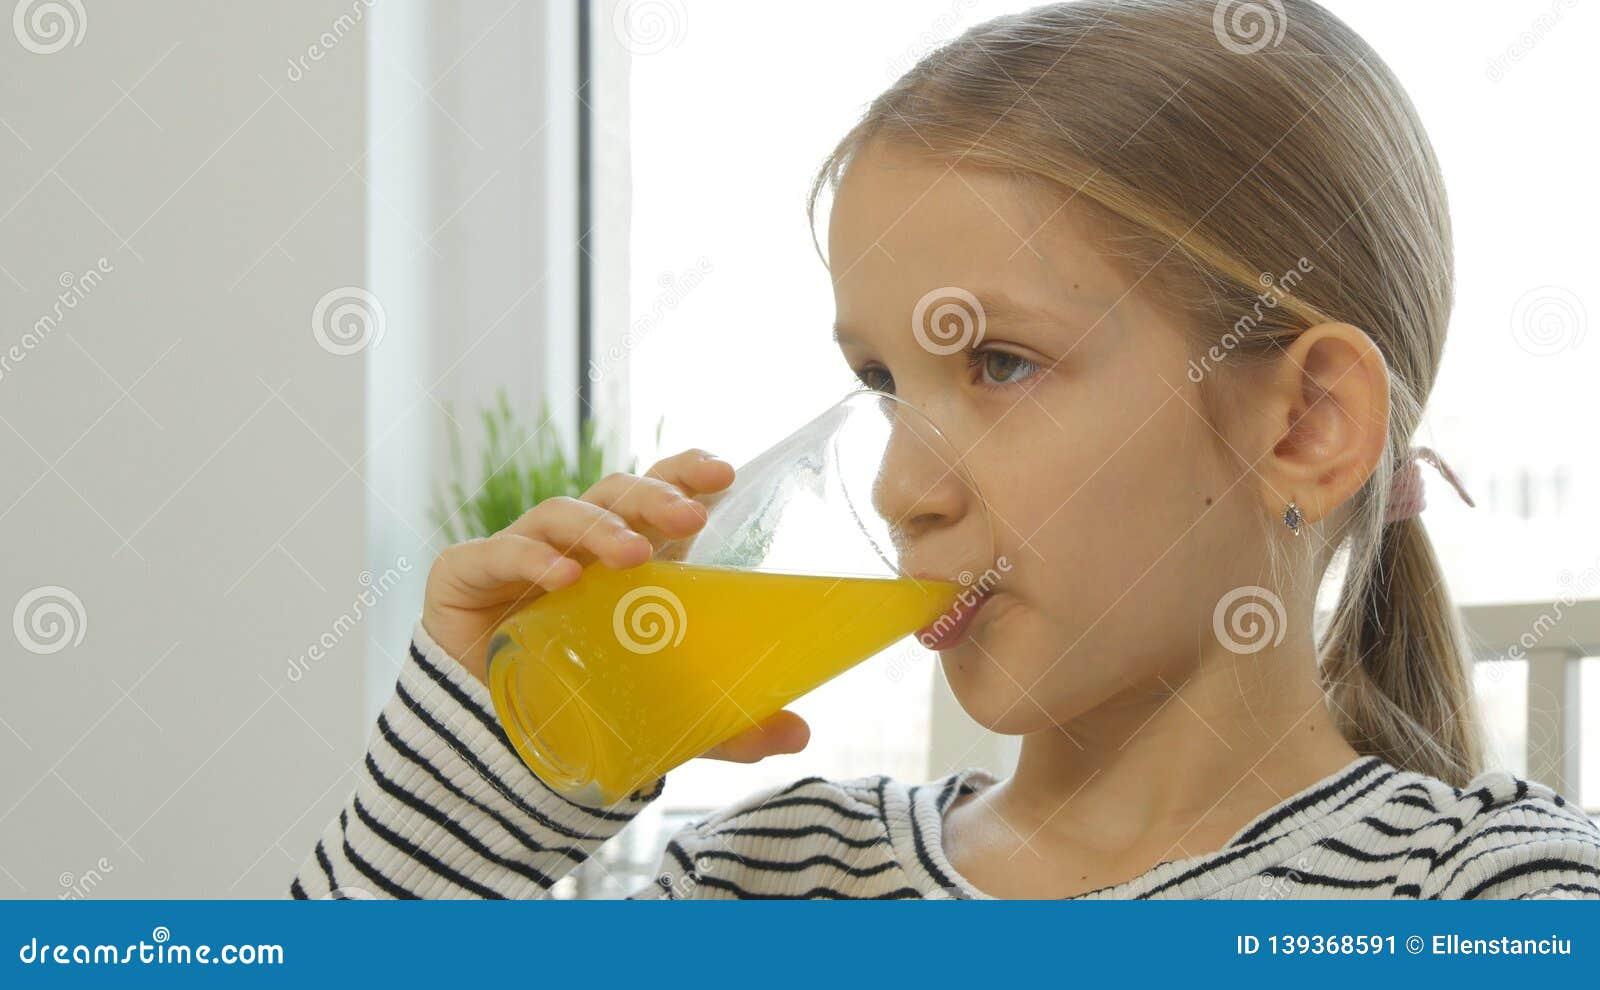 Child Drinking Orange Juice, Kid at Breakfast in Kitchen, Girl Lemon Fresh